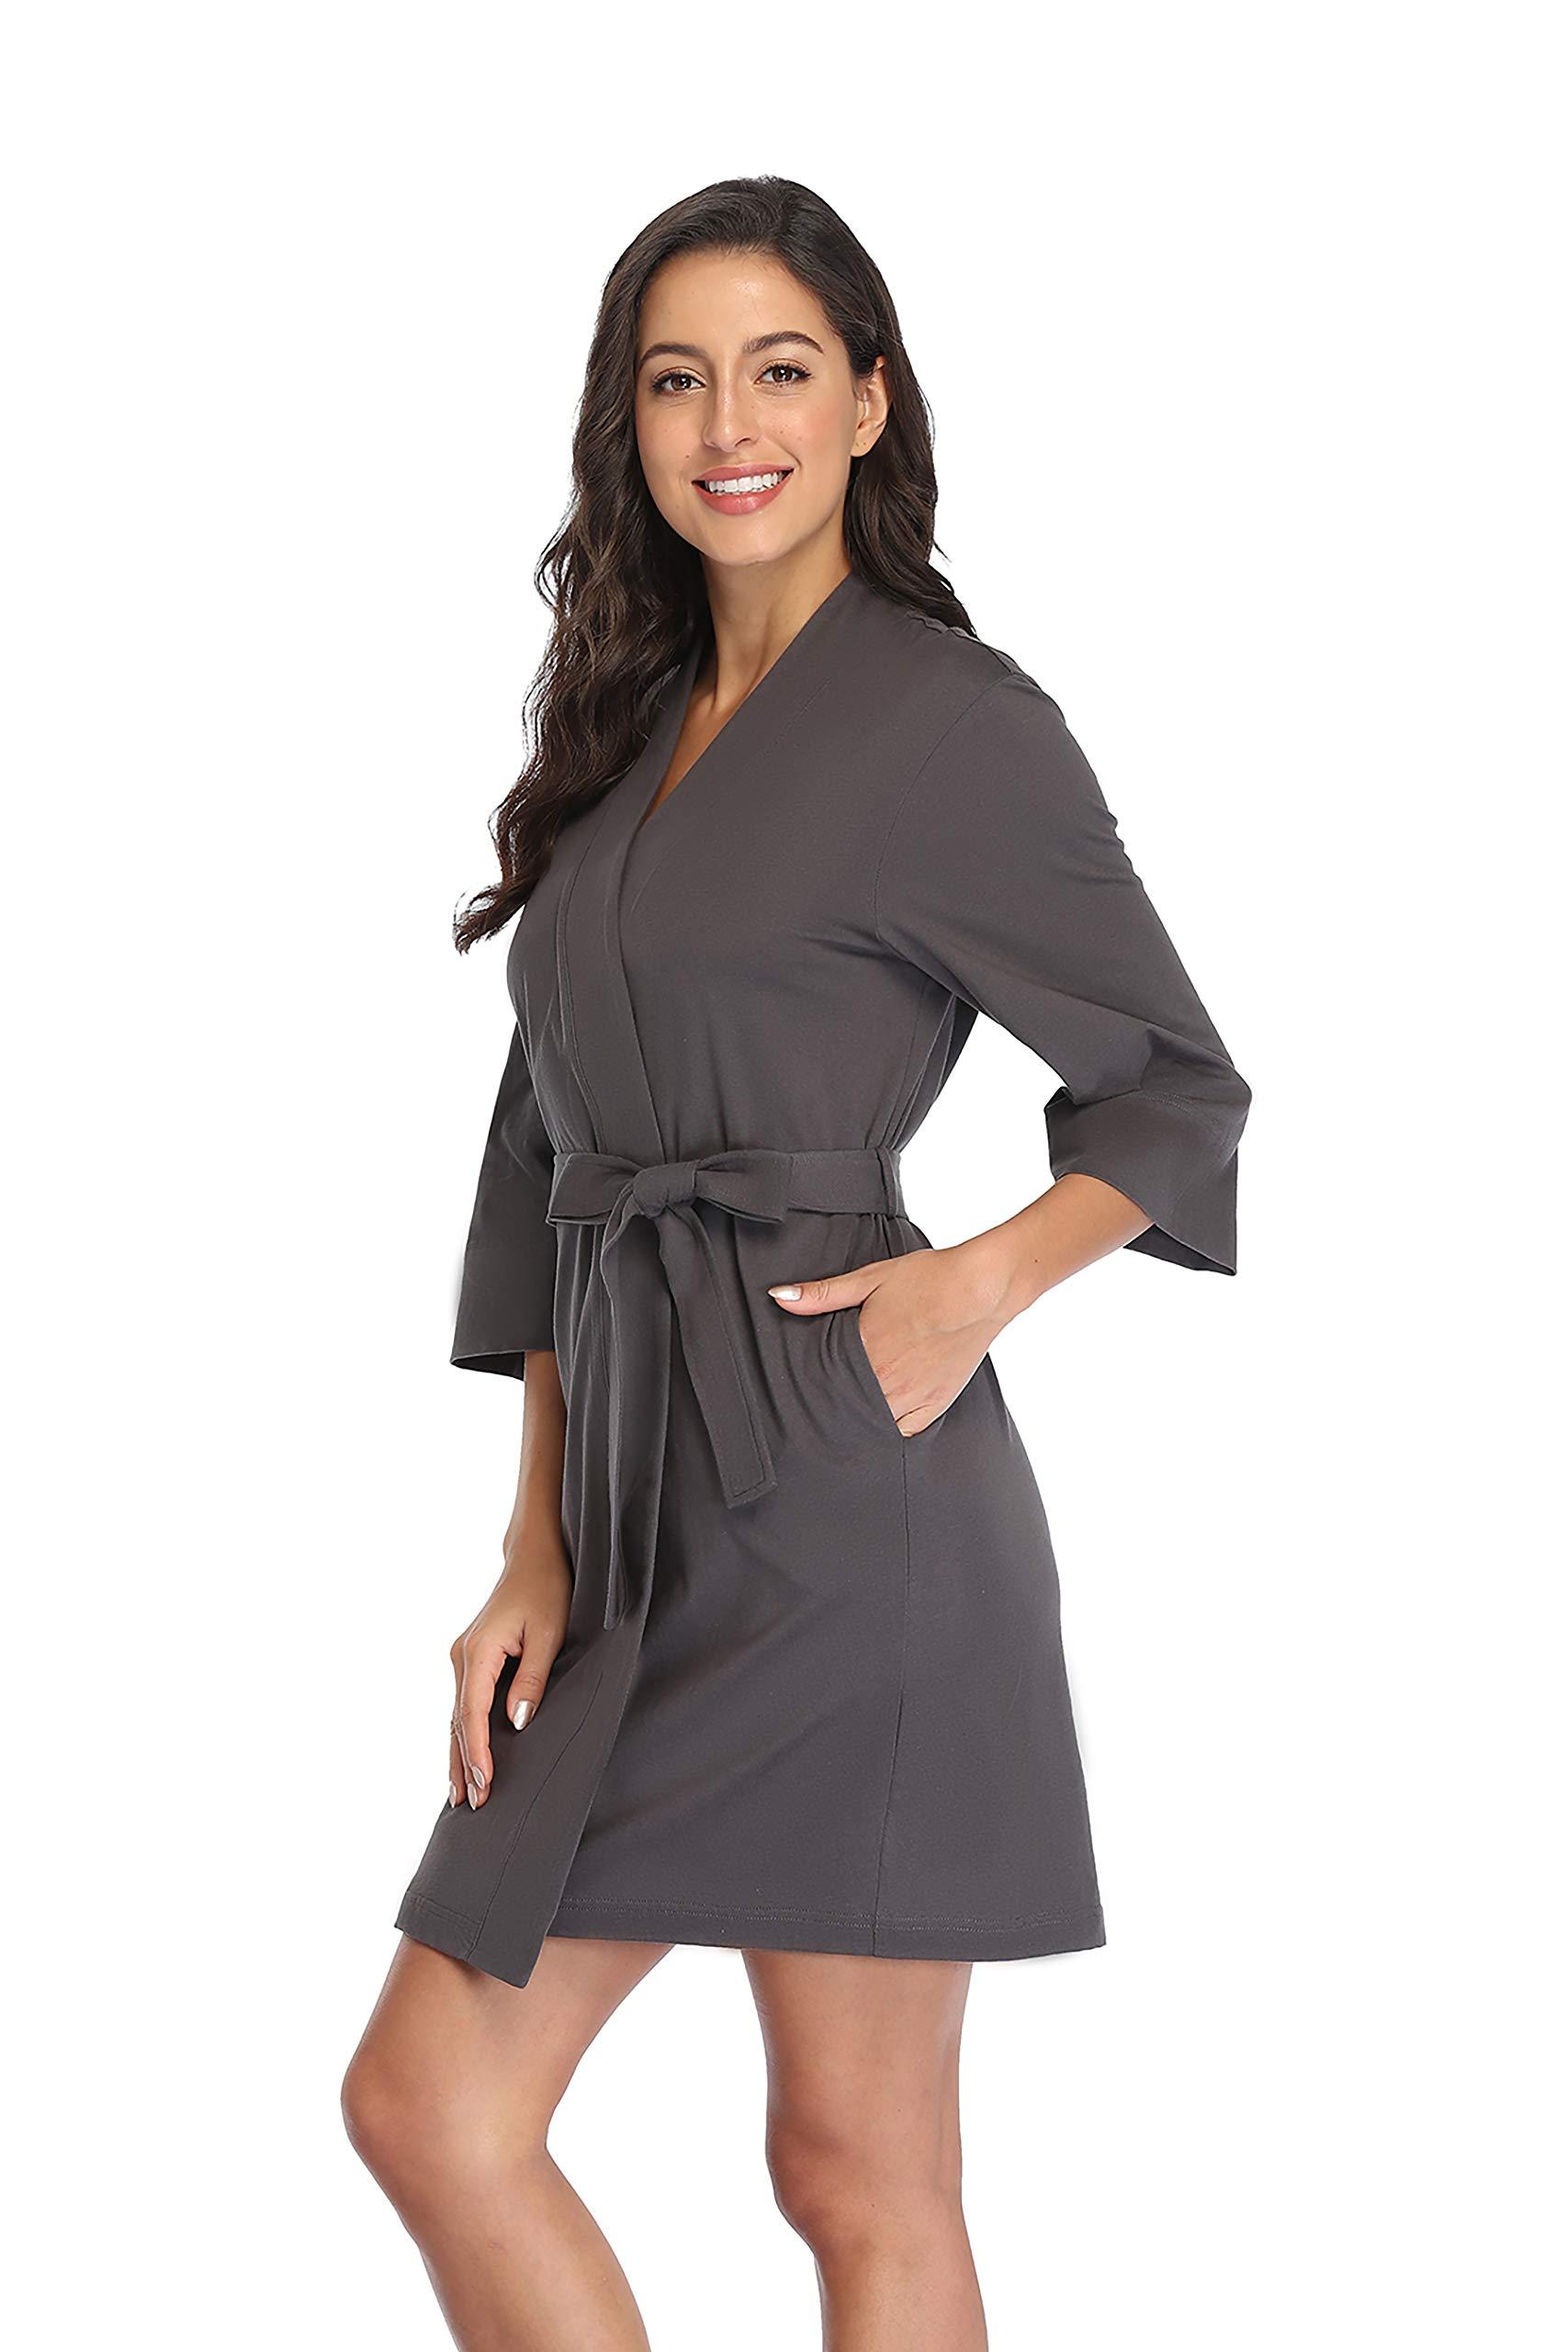 Women's Cotton Short Kimono Robes Knit Bathrobe Nightgown Soft Wrap Sleepwear Loungewear